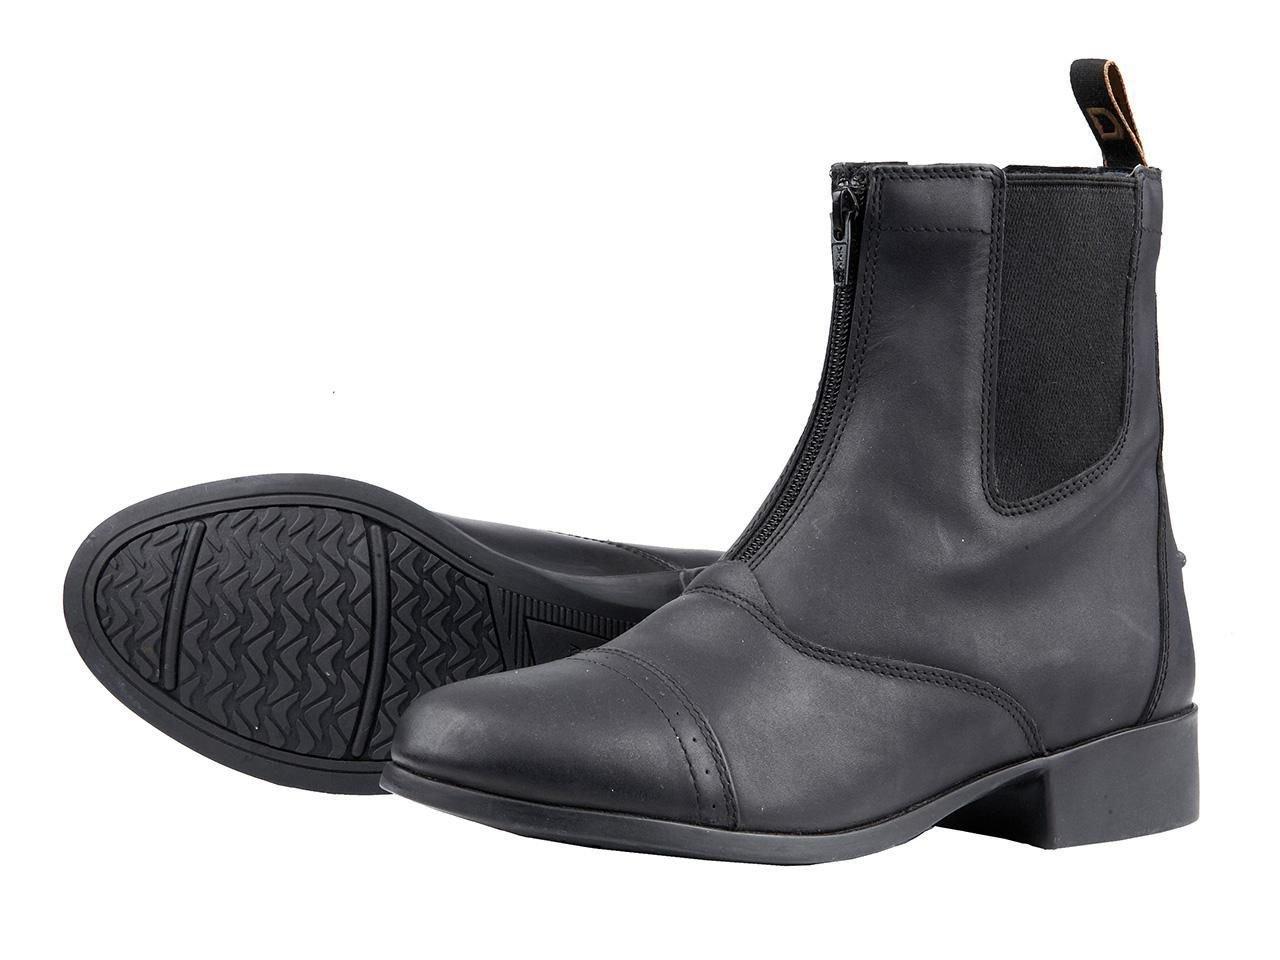 Dublin Ladies Foundation Zip Paddock Boots - Black - Size: 8 by Dublin